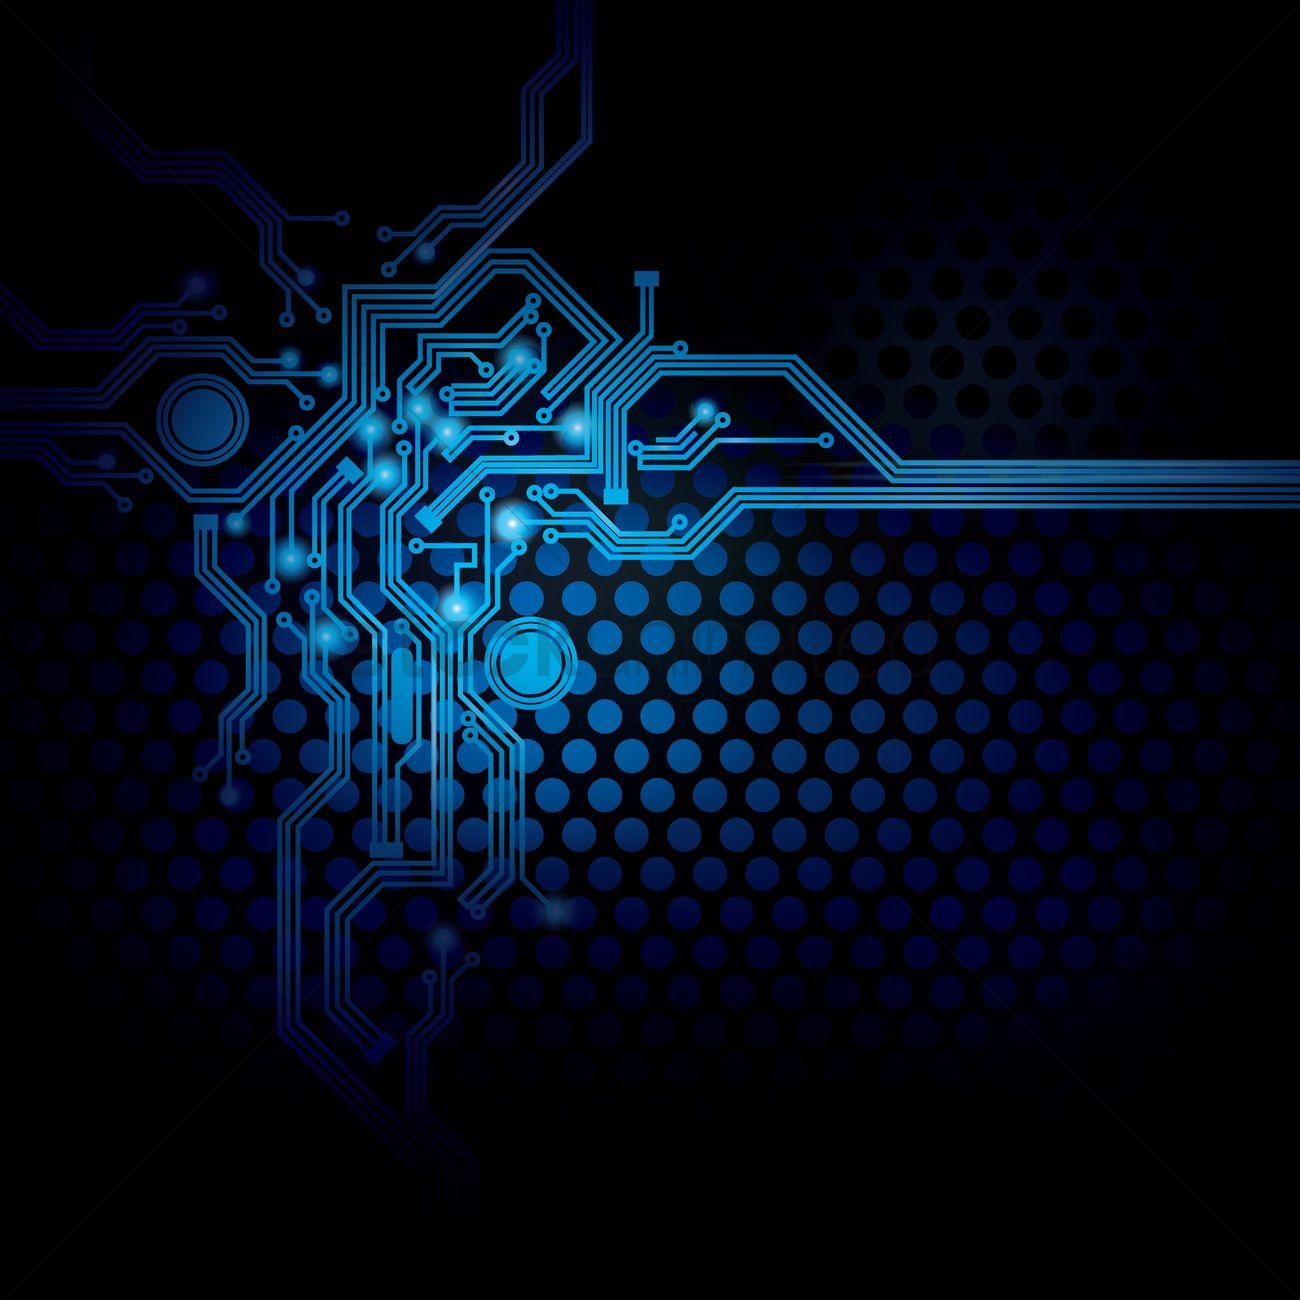 Circuit design on digital background Vector Image   1647006 1300x1300